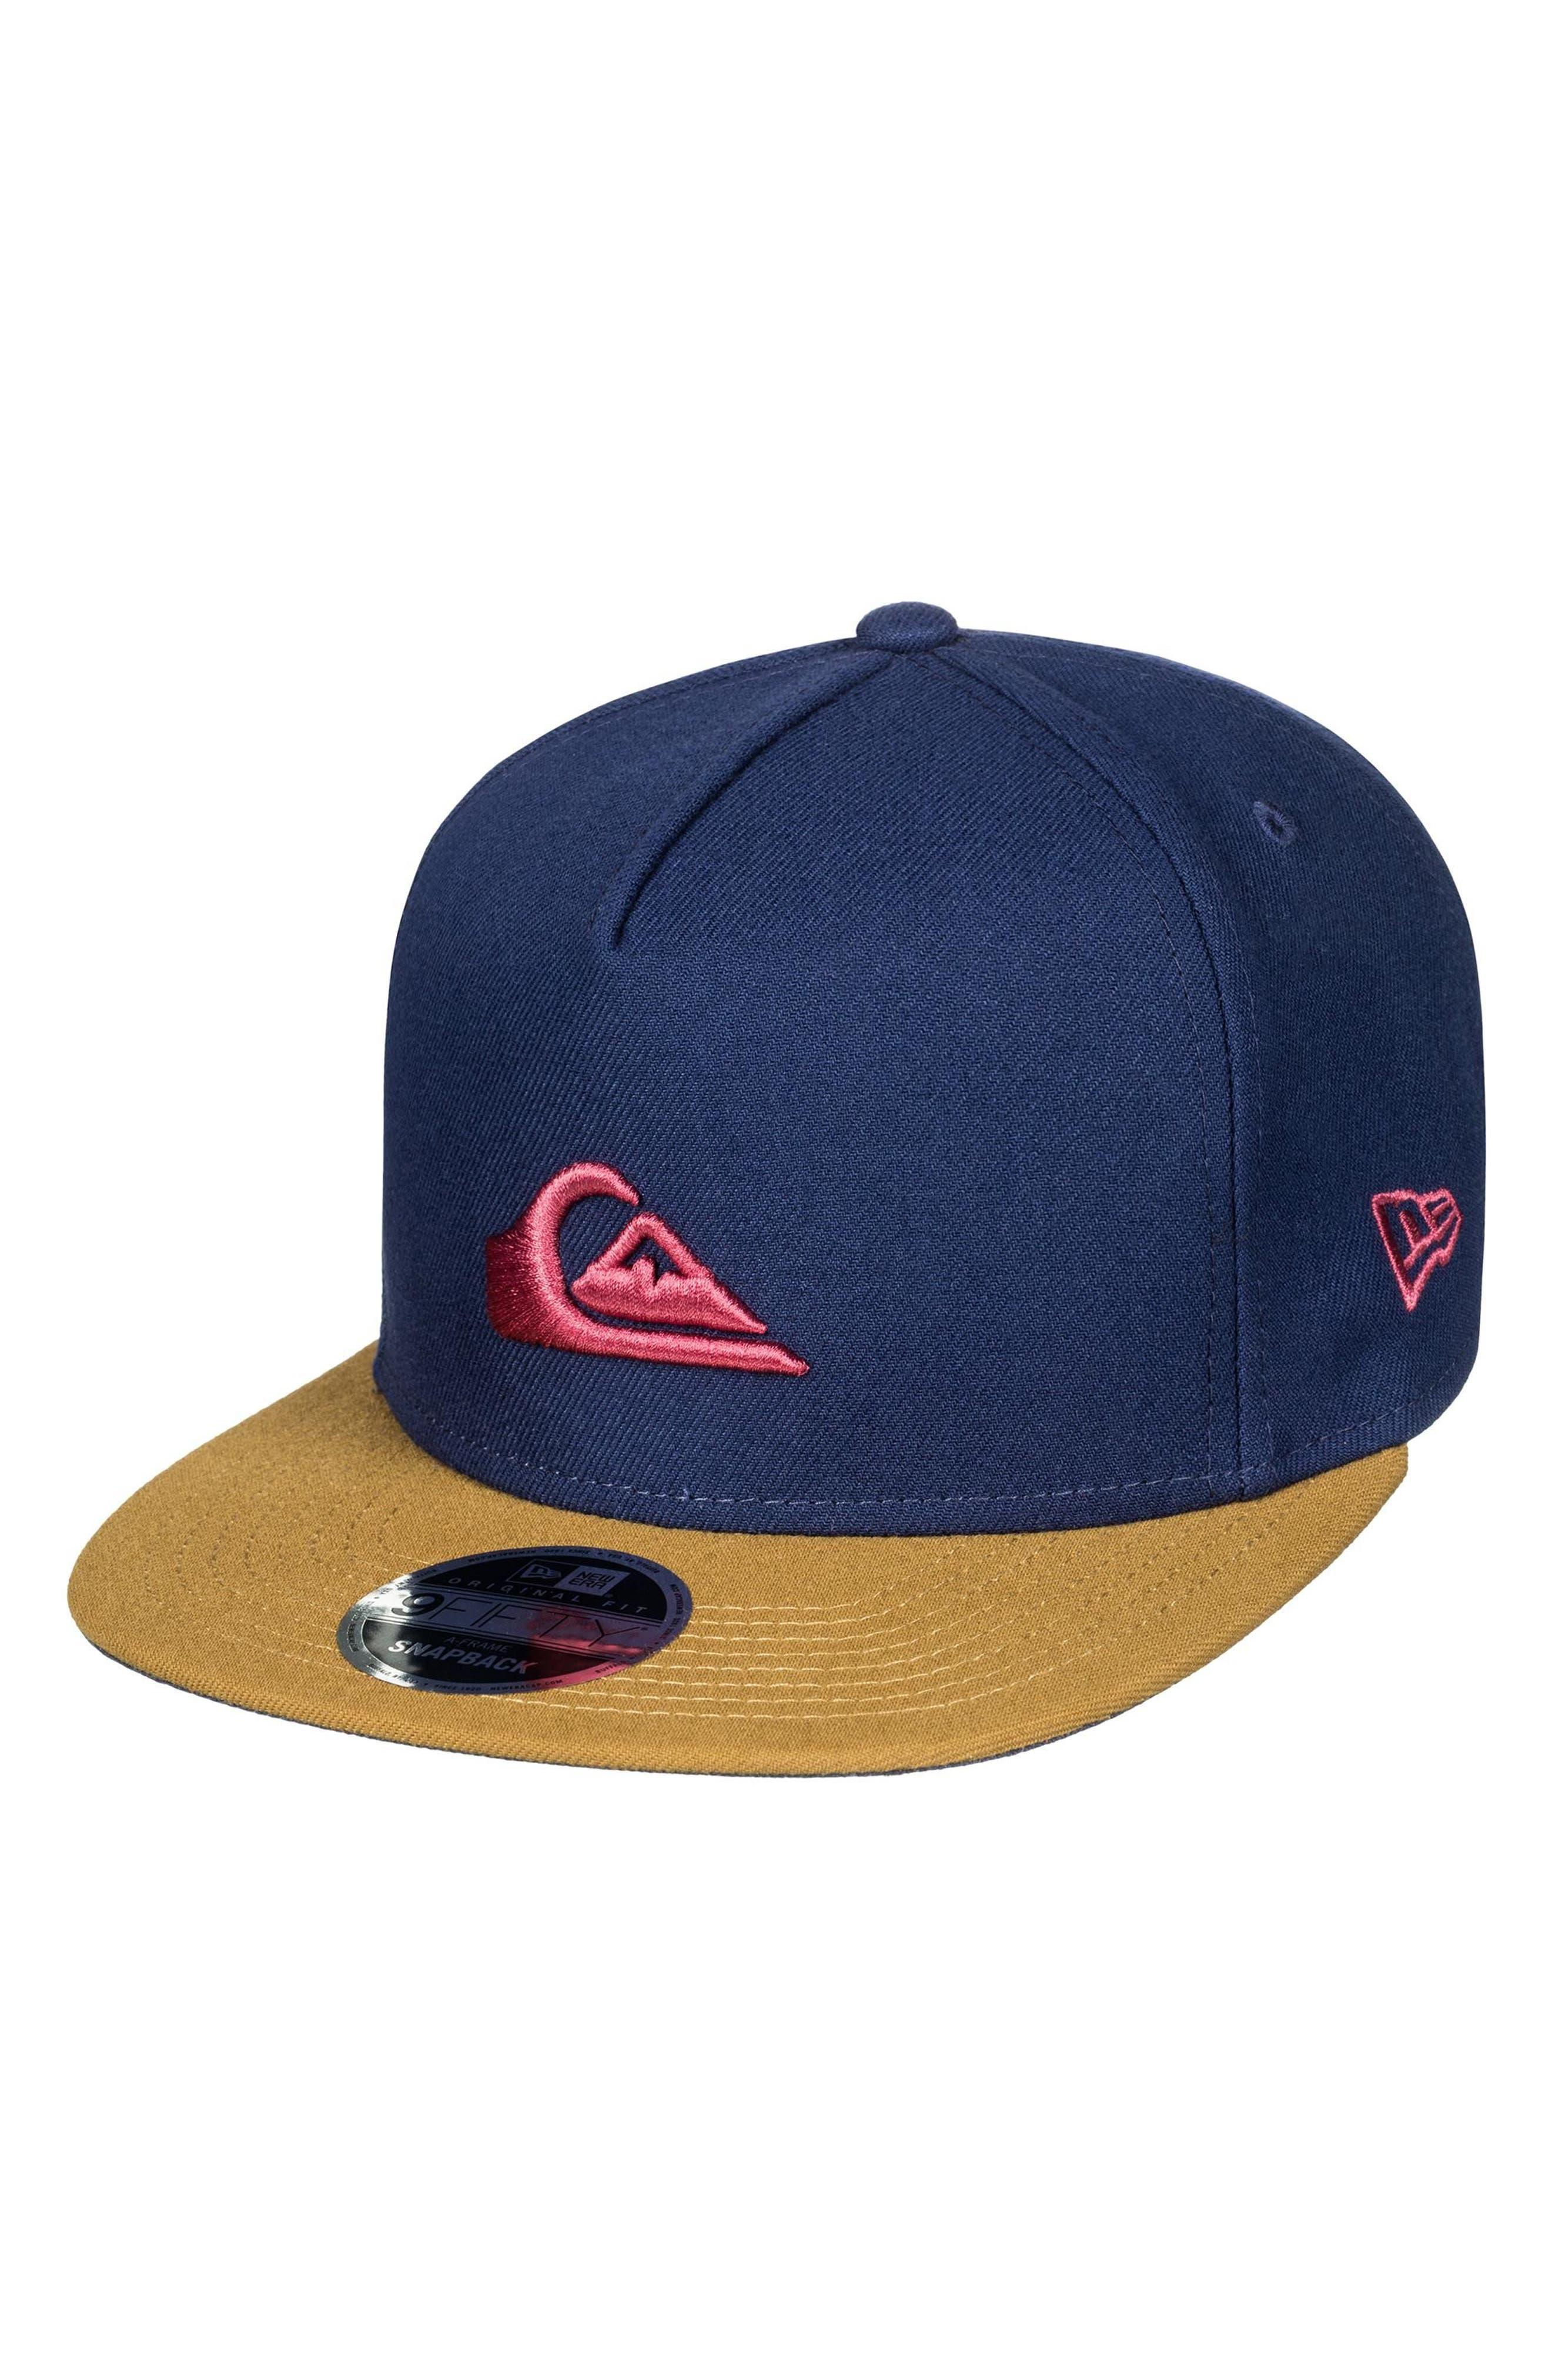 x New Era Stuckles Snapback Cap,                         Main,                         color, Navy Blazer